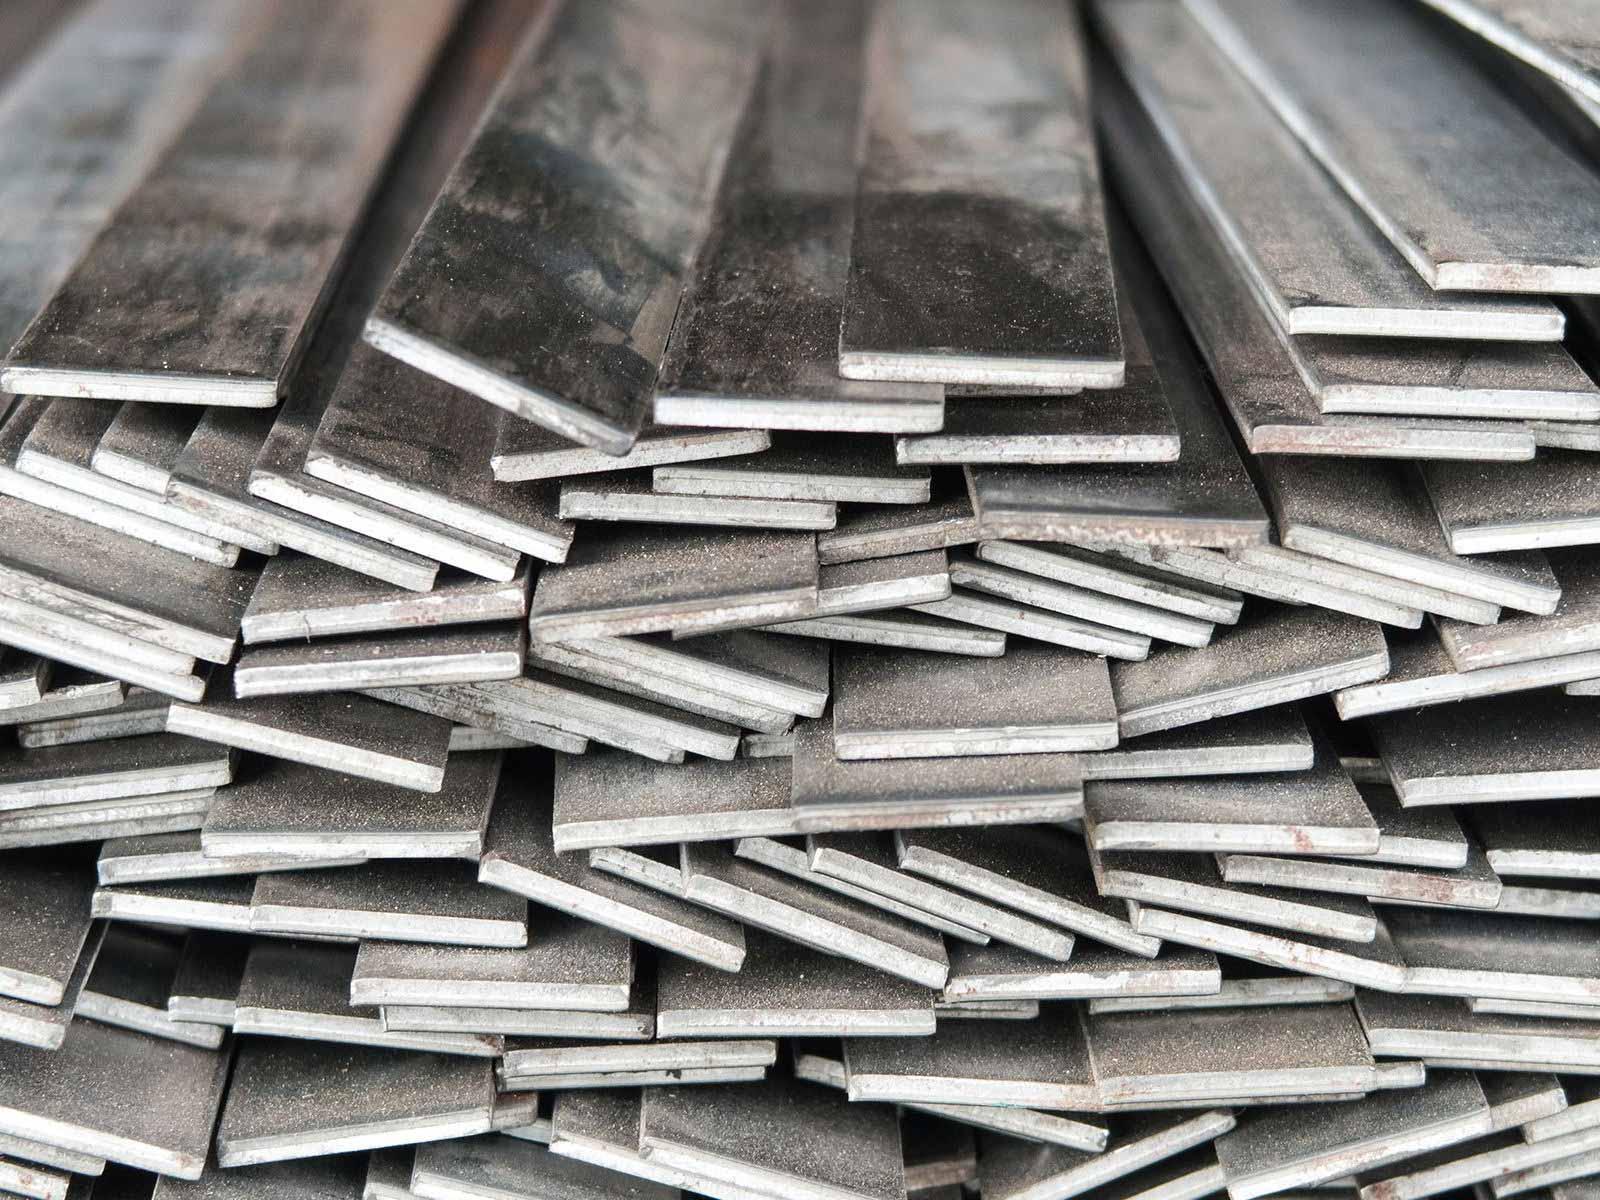 Mild Steel Flat Bar 6mm Thickness X 50mm Width 0 5m 6m Lengths Length 0 5m Amazon Co Uk Diy Tools